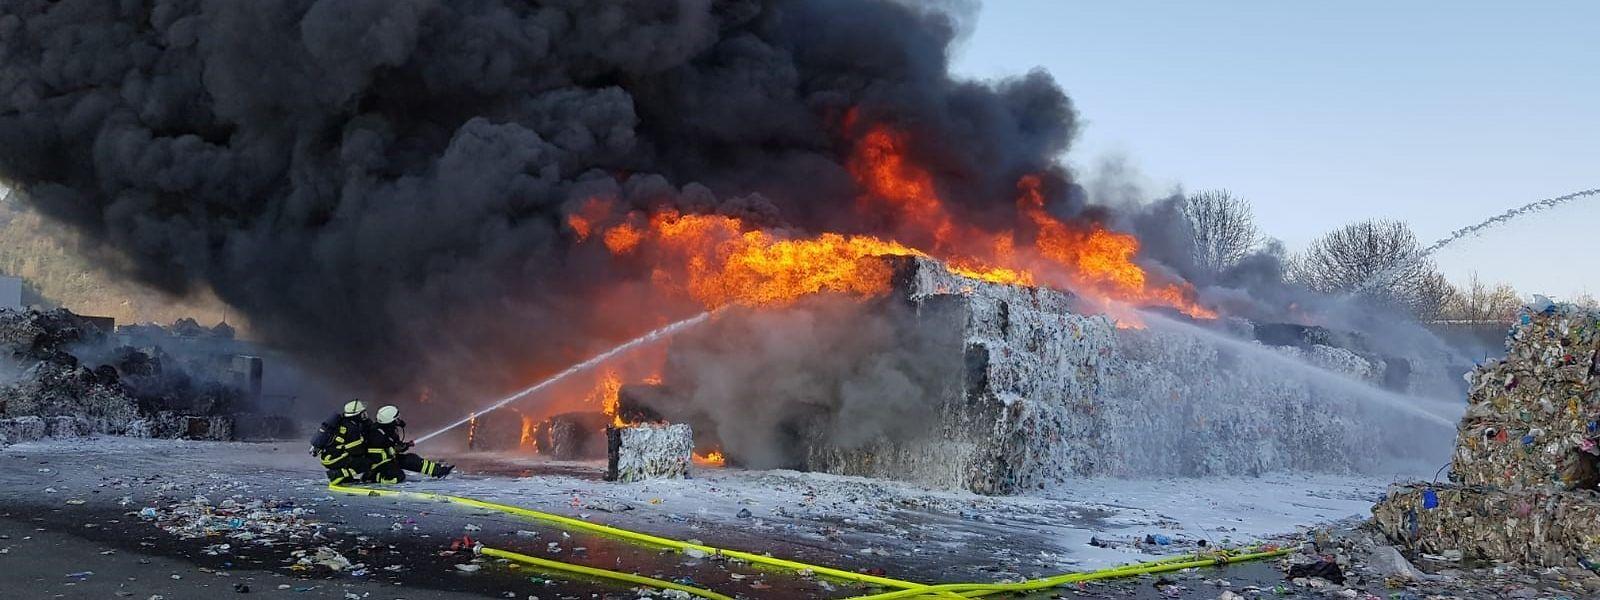 Personen kamen bei dem Brand nicht zu Schaden.